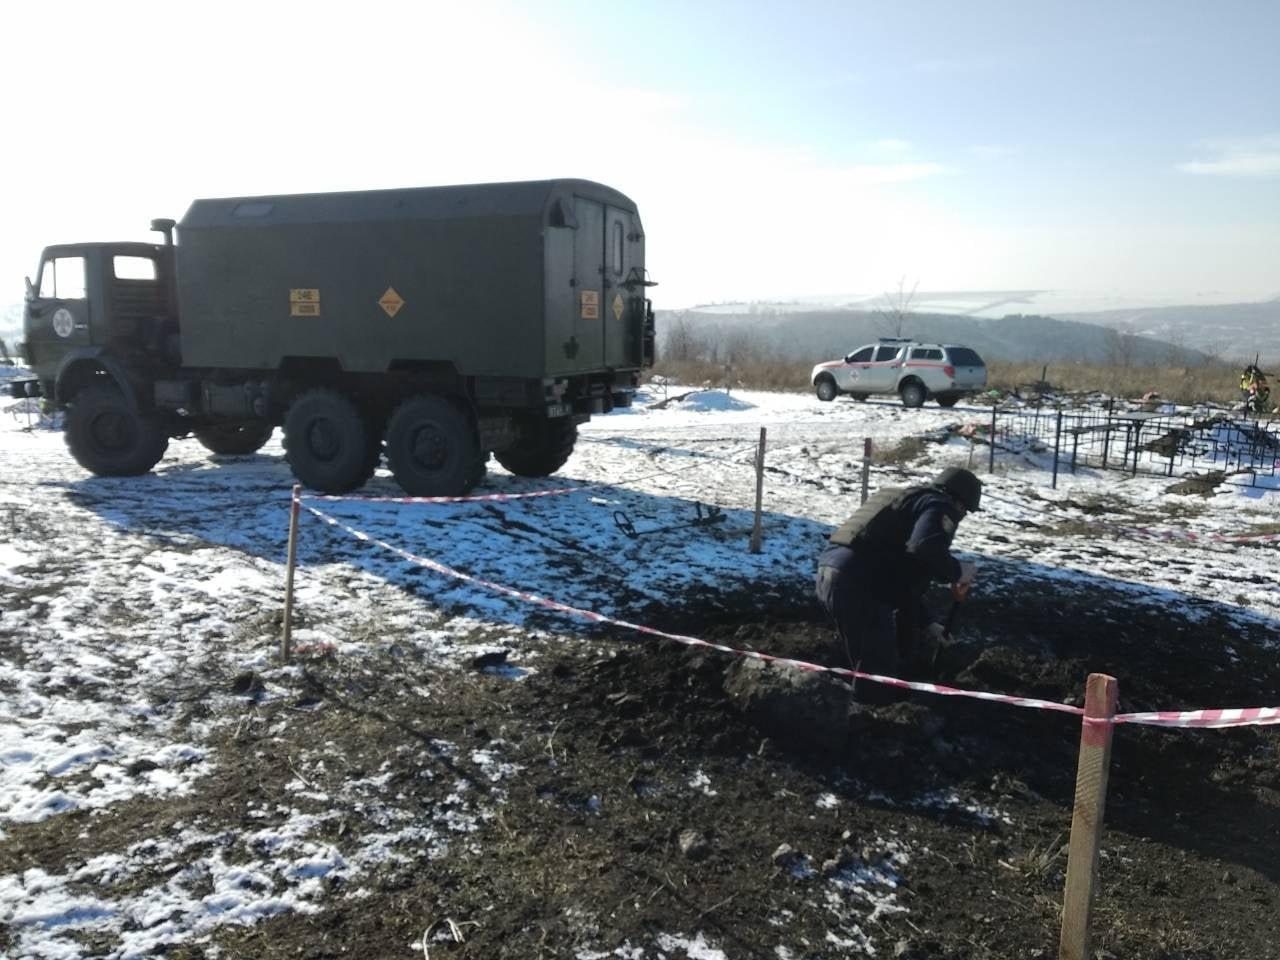 В Одесской области на кладбище нашли артснаряд, - ФОТО, фото-11